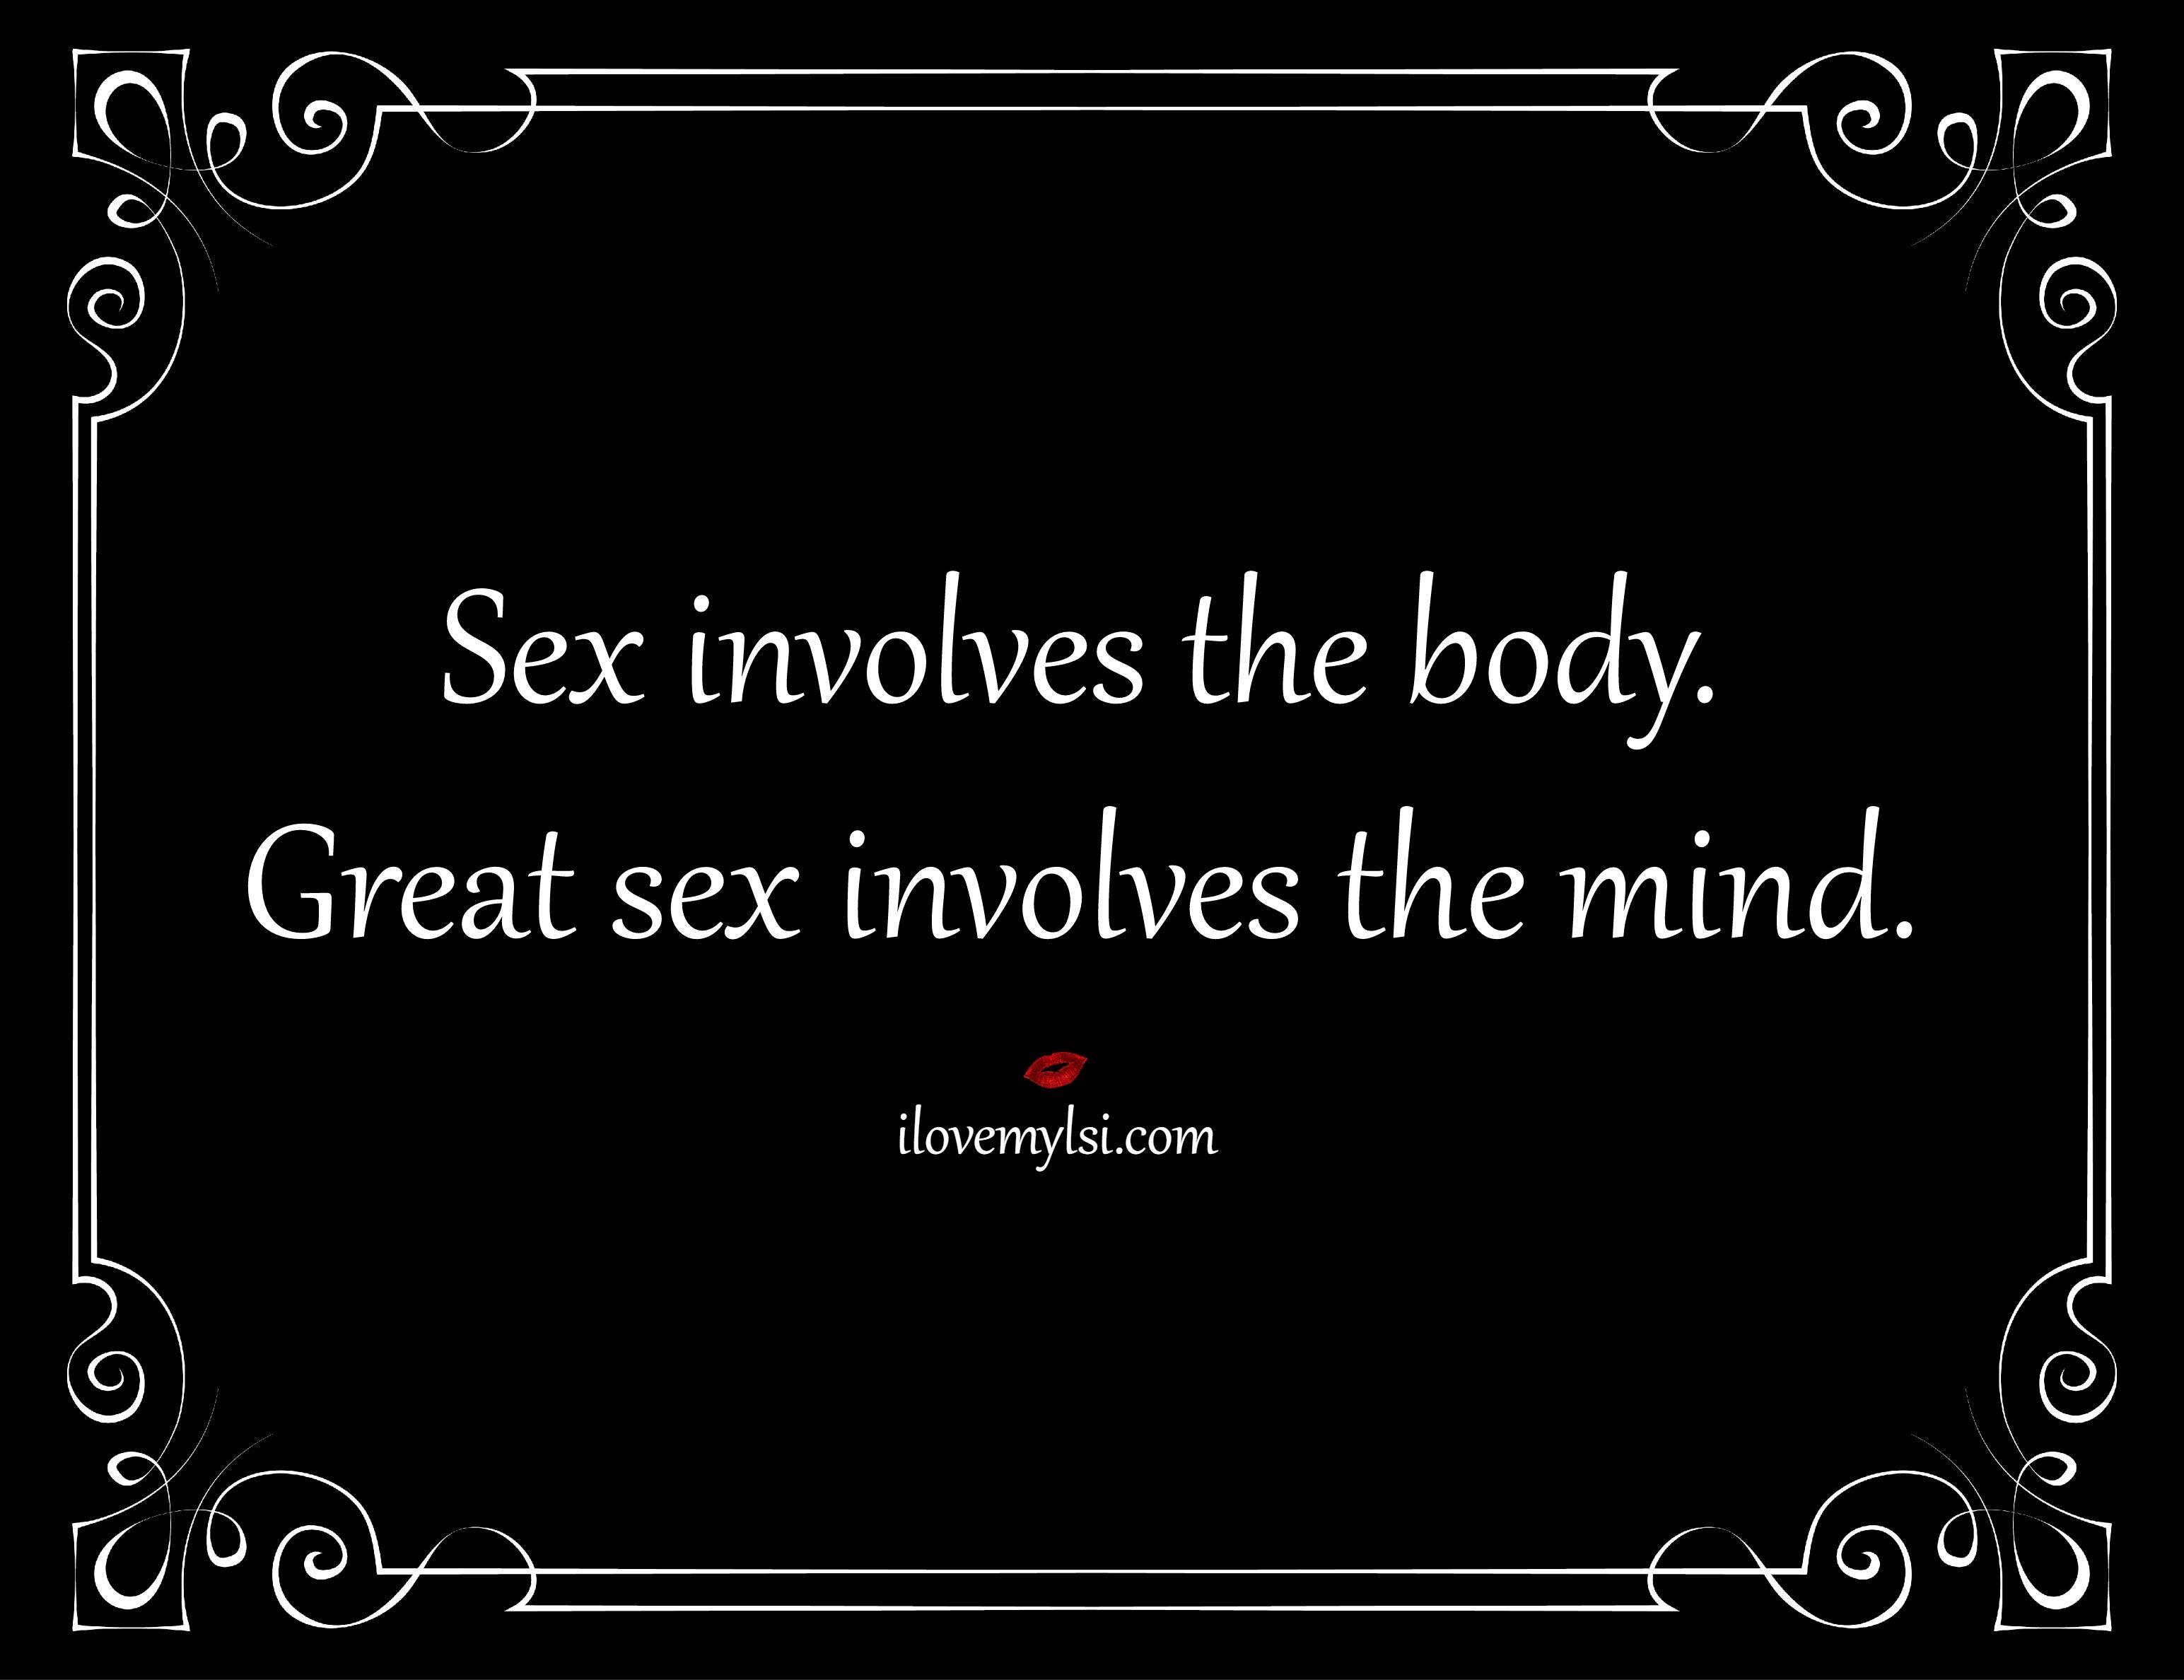 involves the body